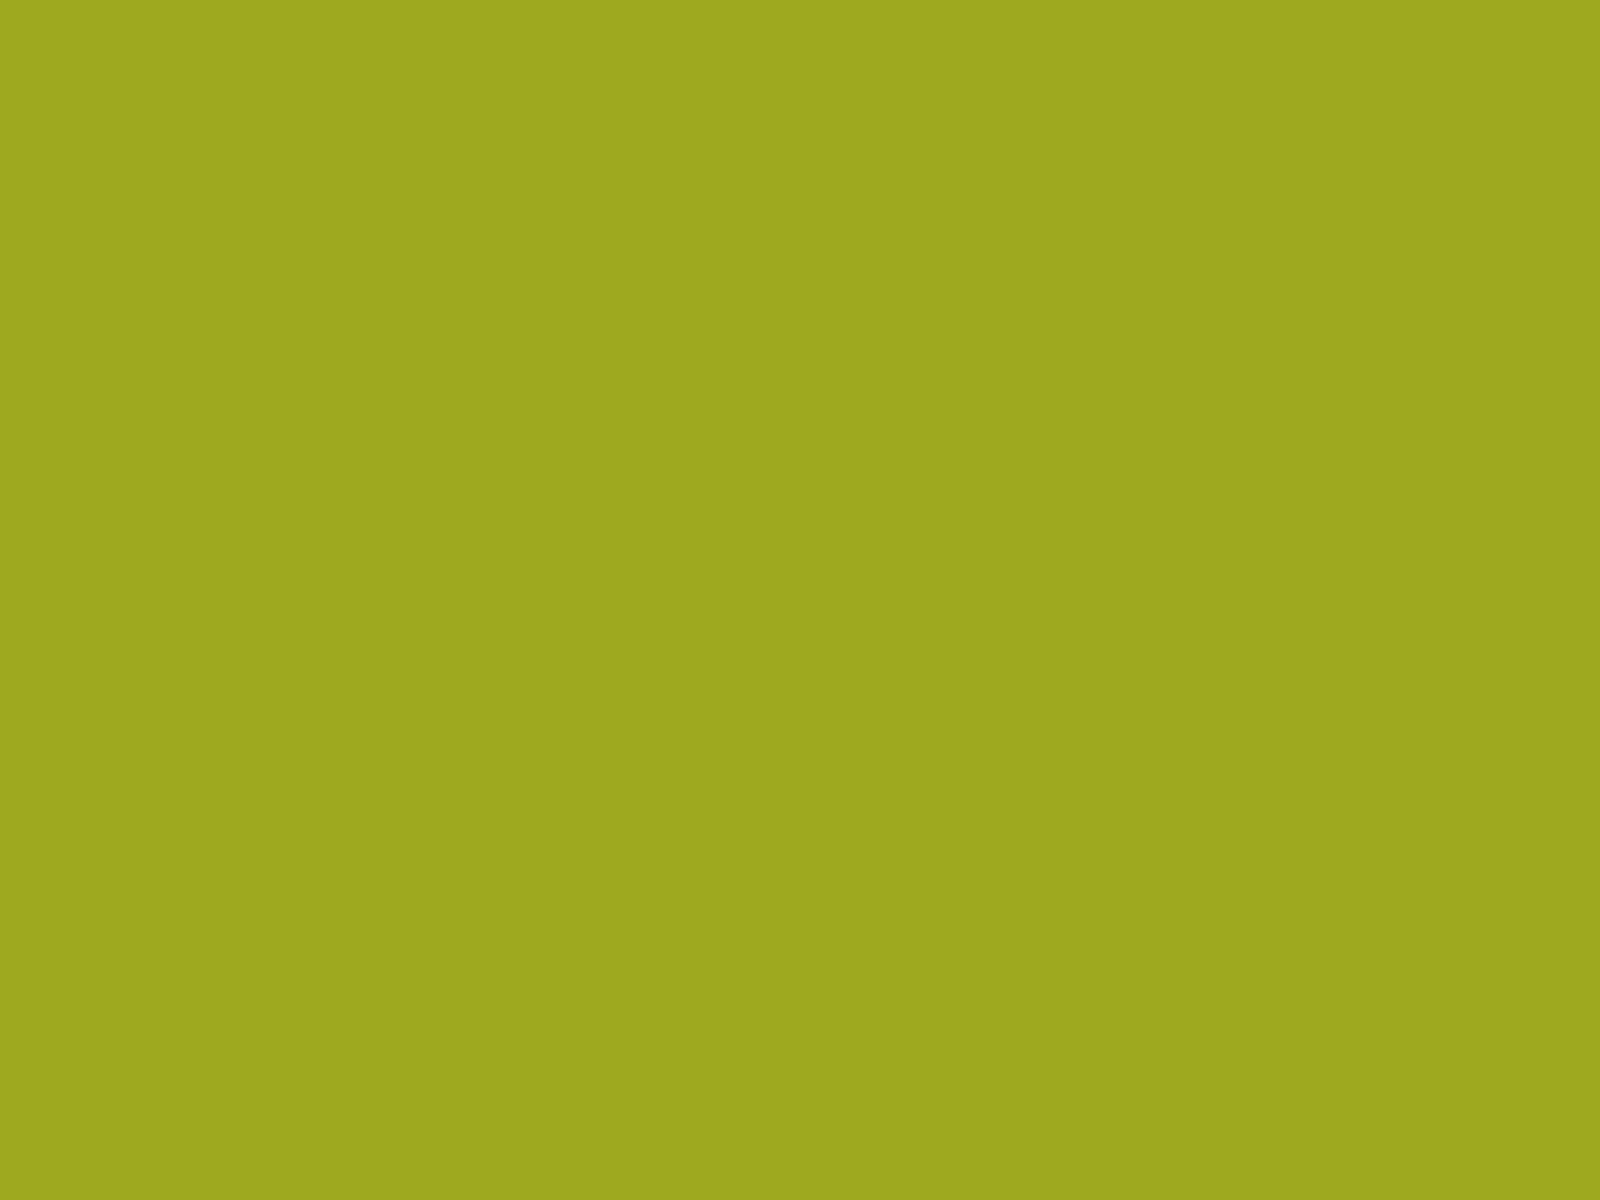 1600x1200 Citron Solid Color Background